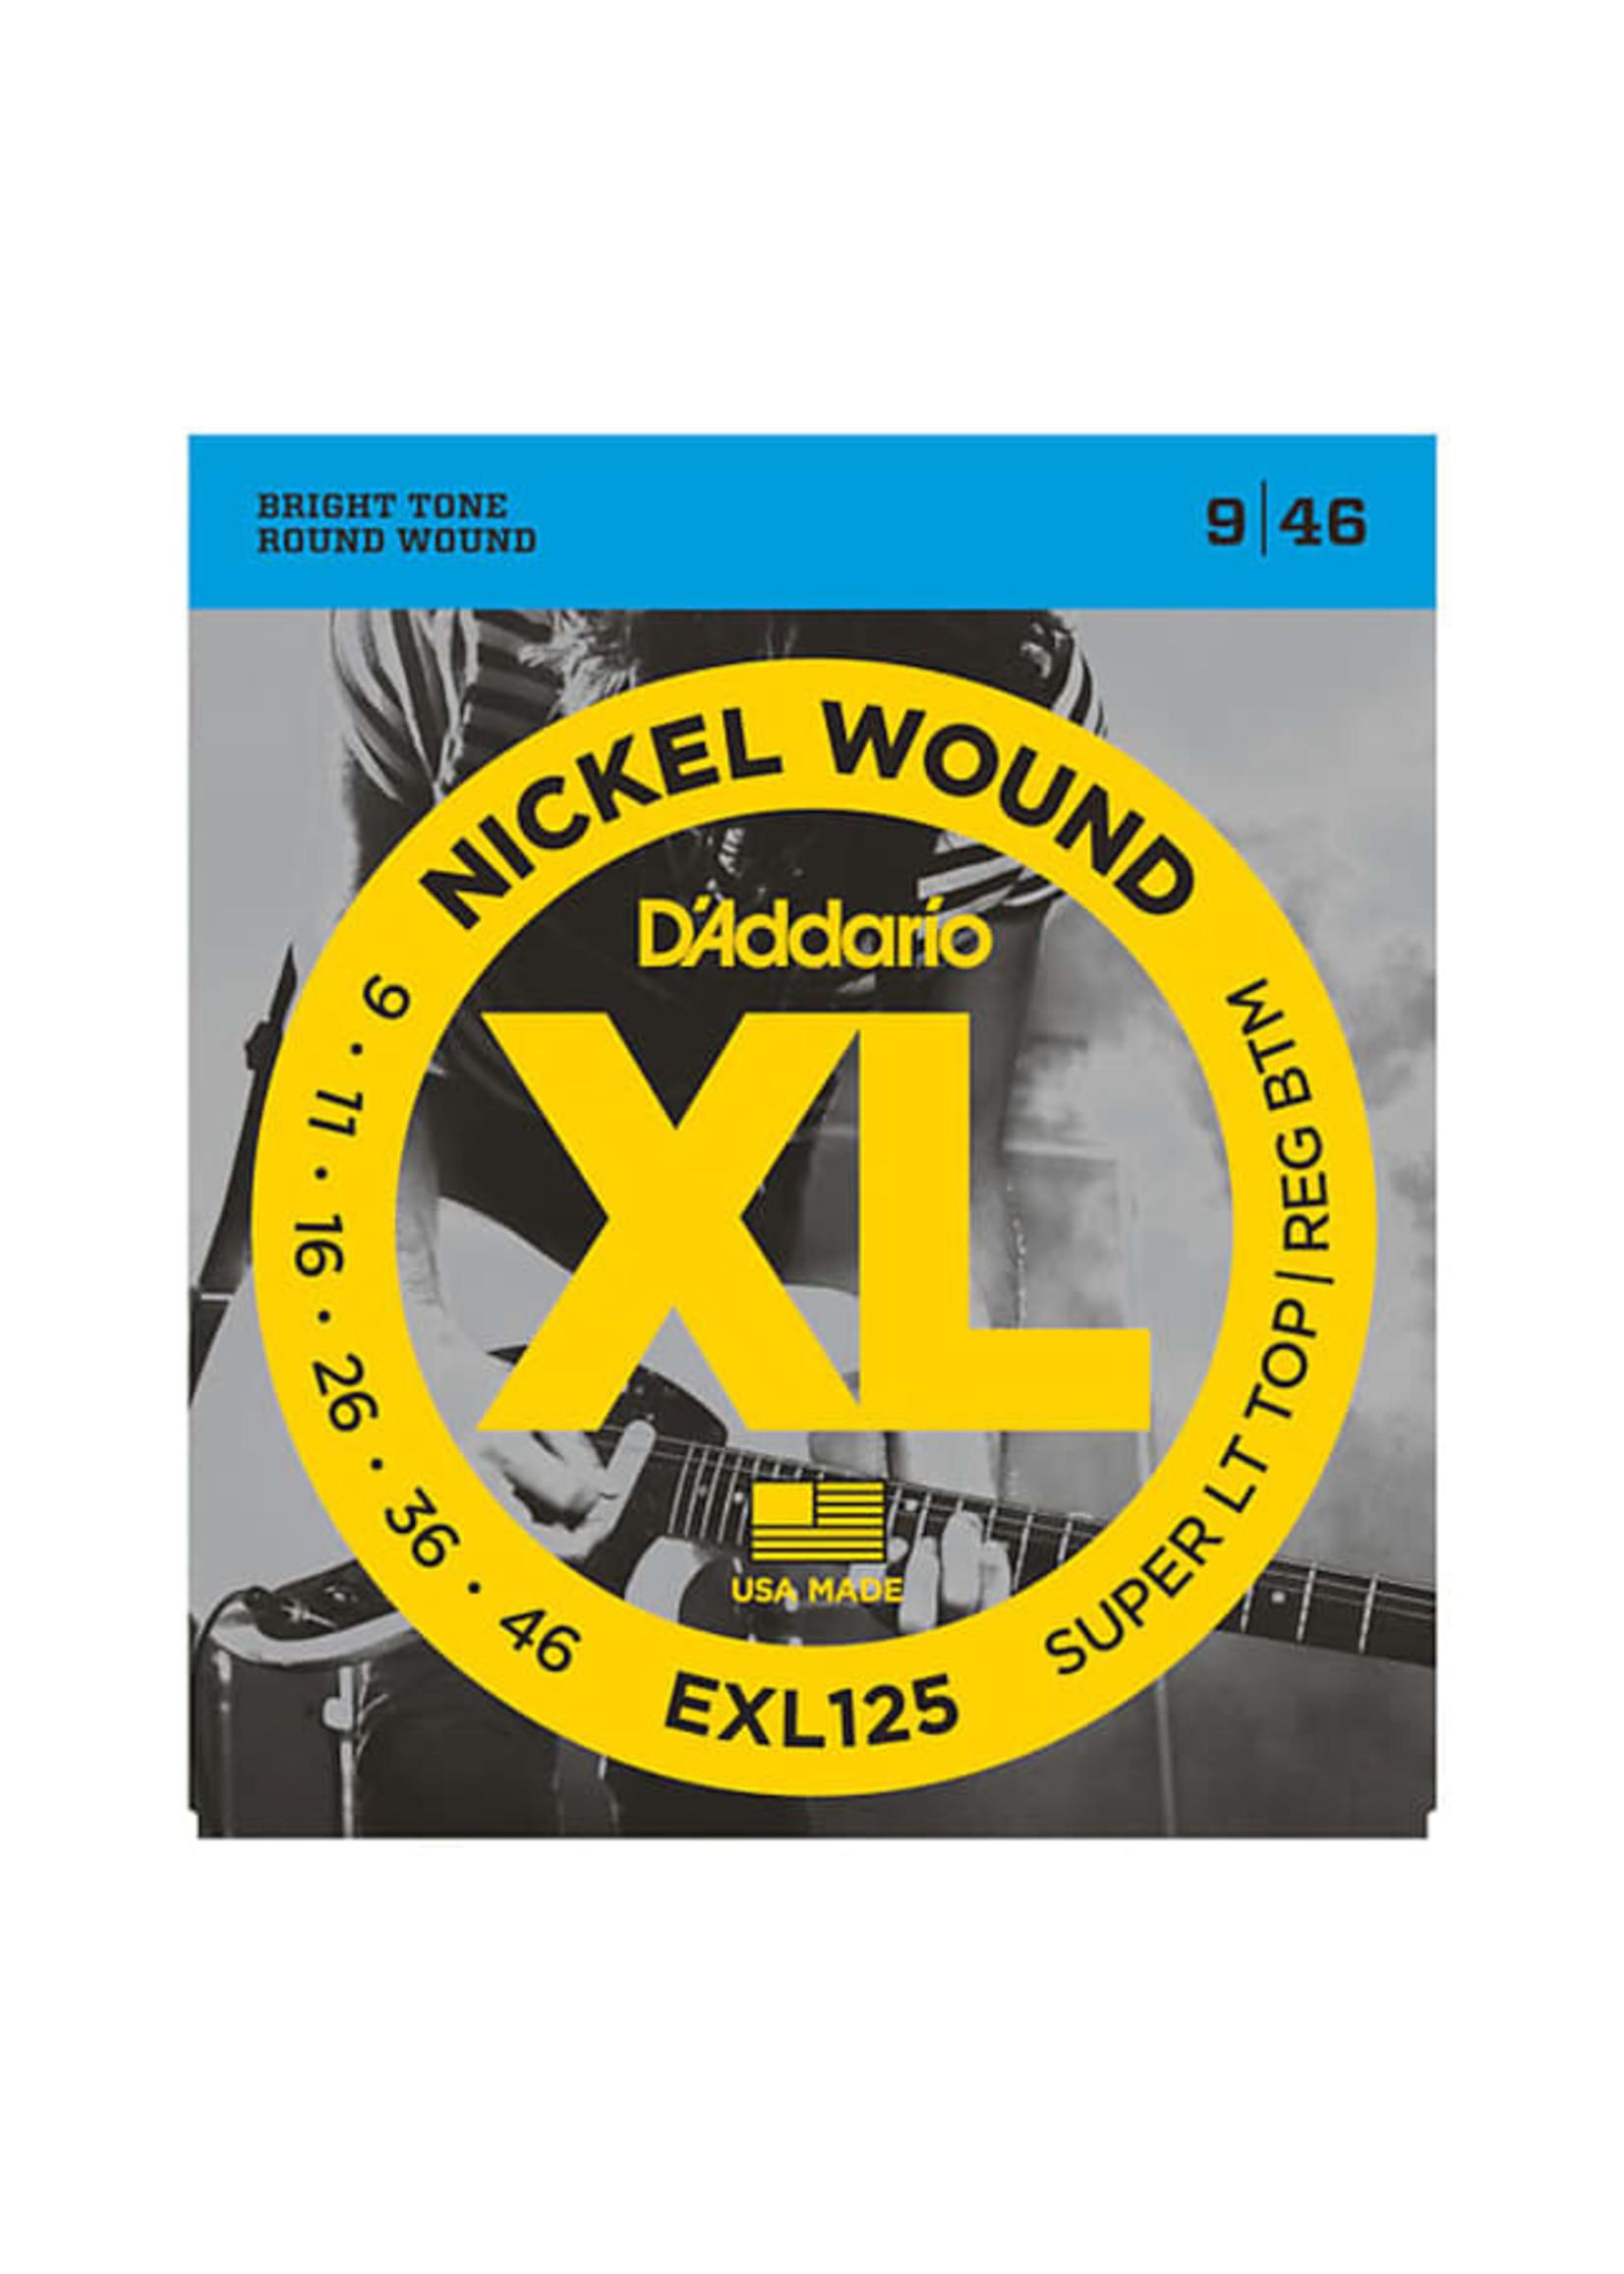 D'Addario D'Addario EXL125 9-46 Electric Guitar Strings